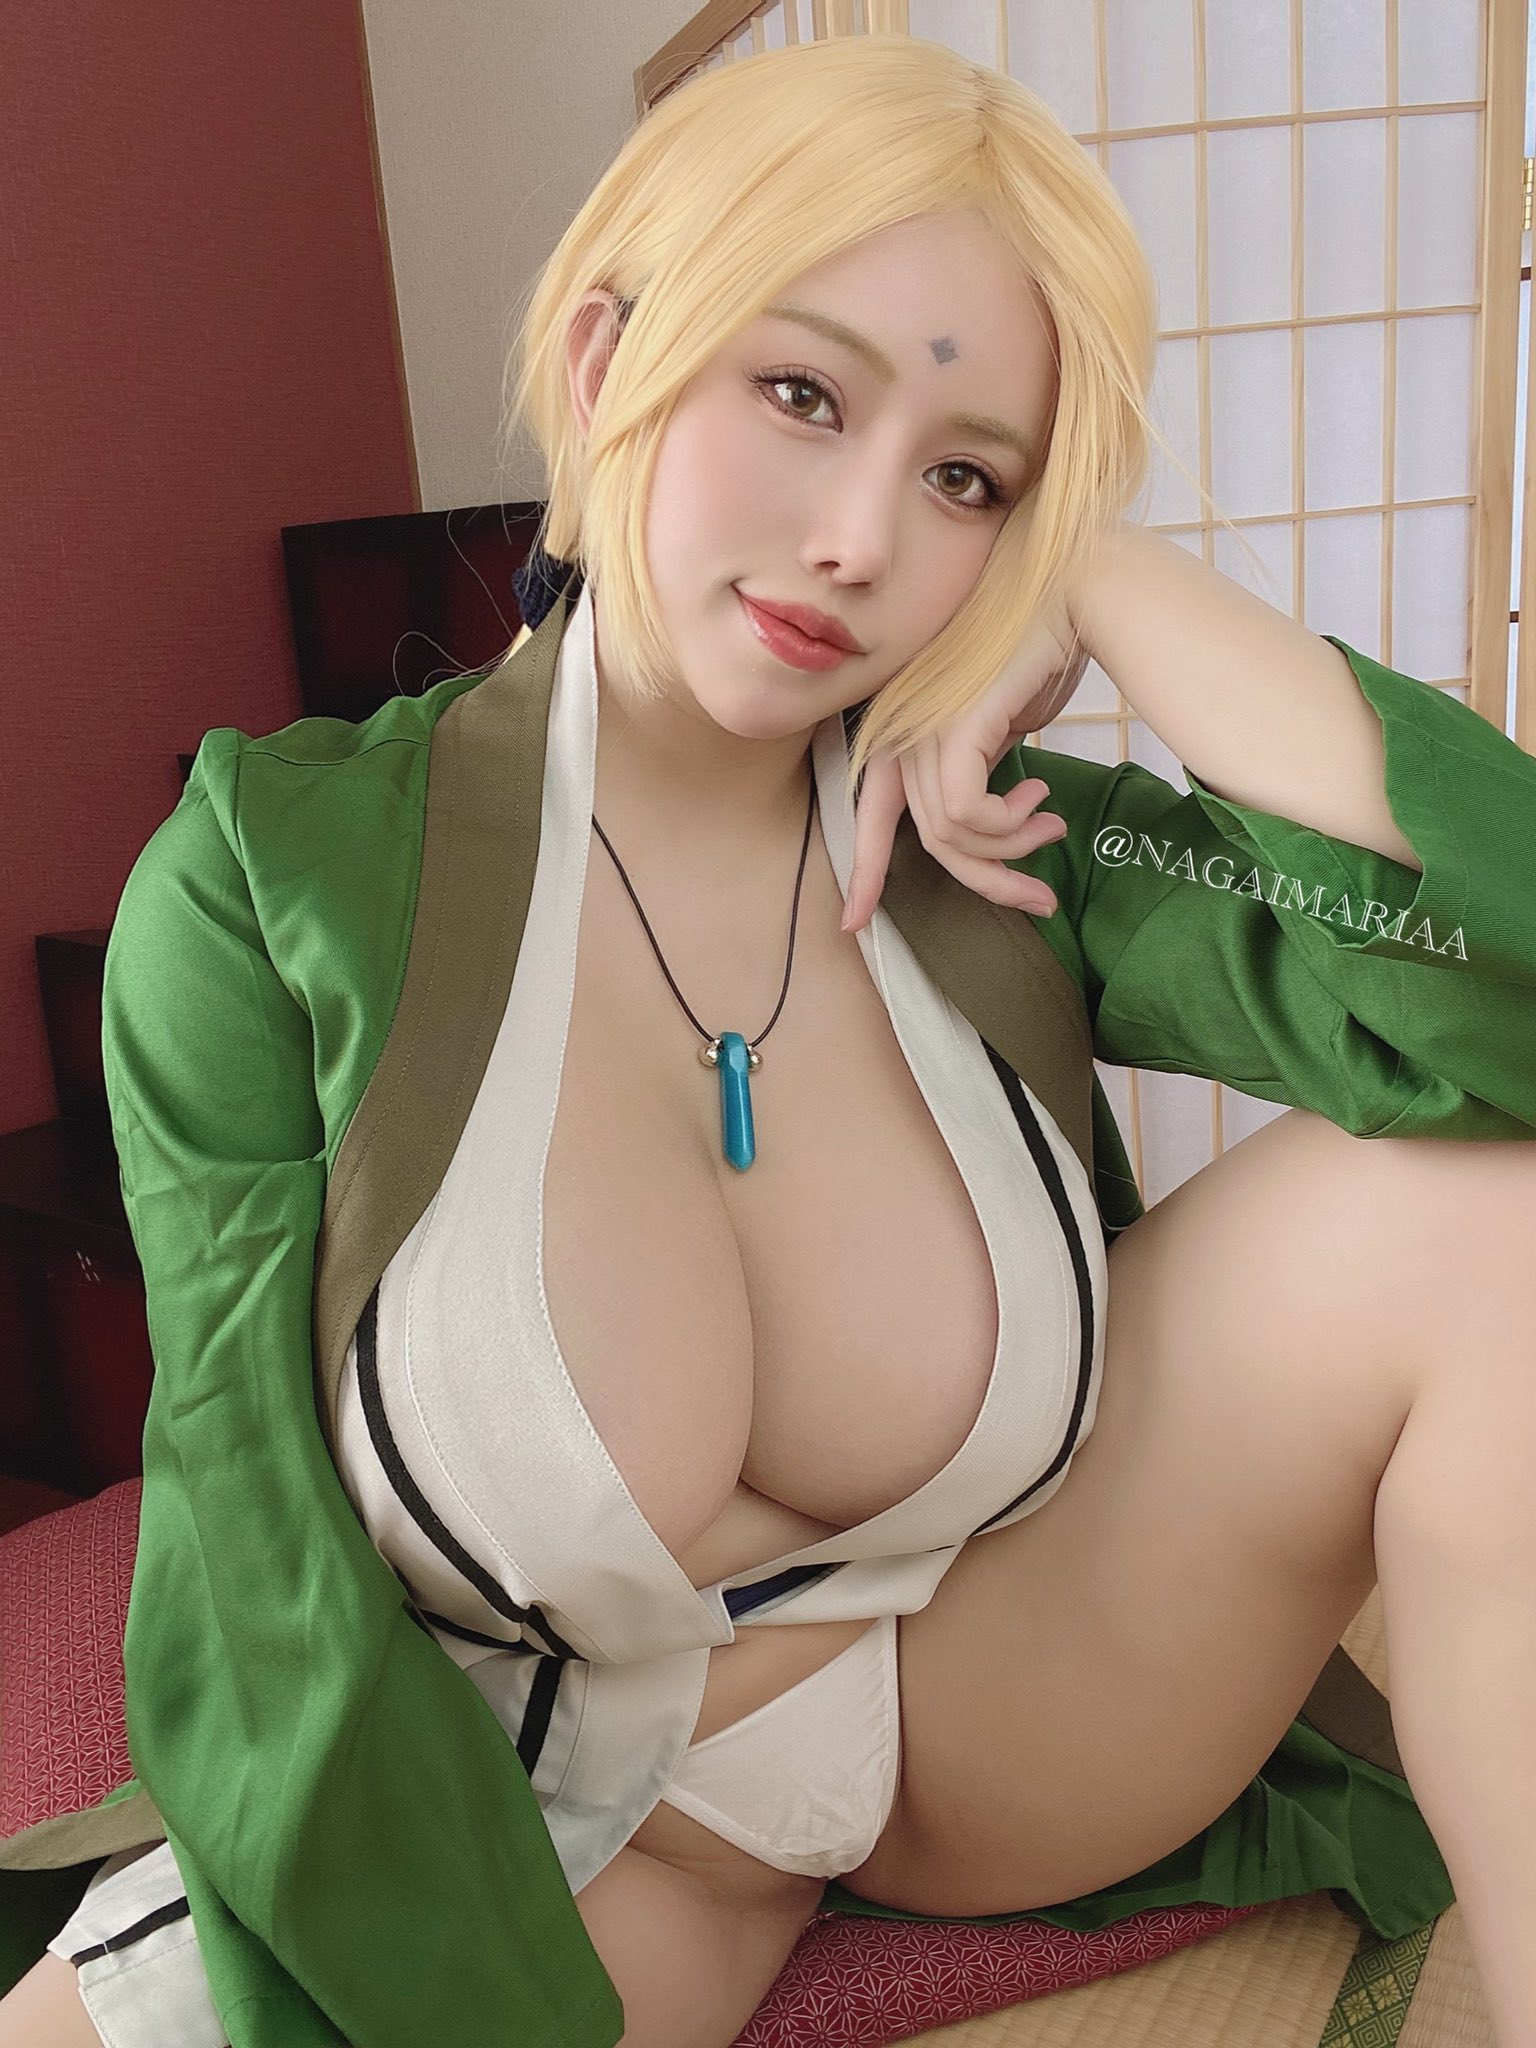 Nagai Maria Nude Leaked (3 Videos + 136 Photos) 281